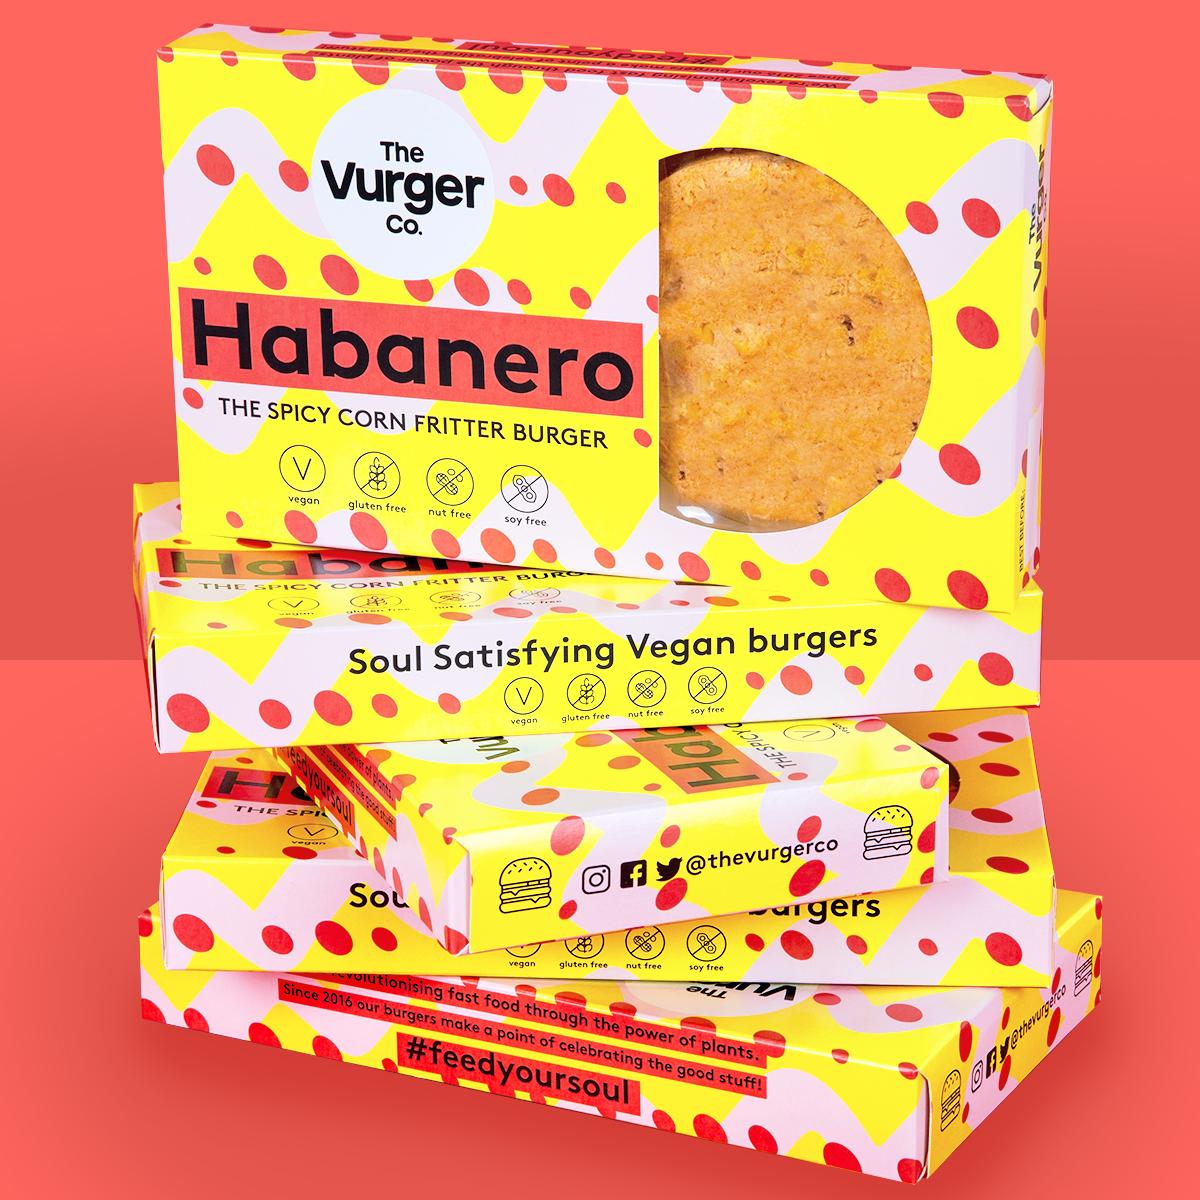 the-vurger-co-habanero.jpg